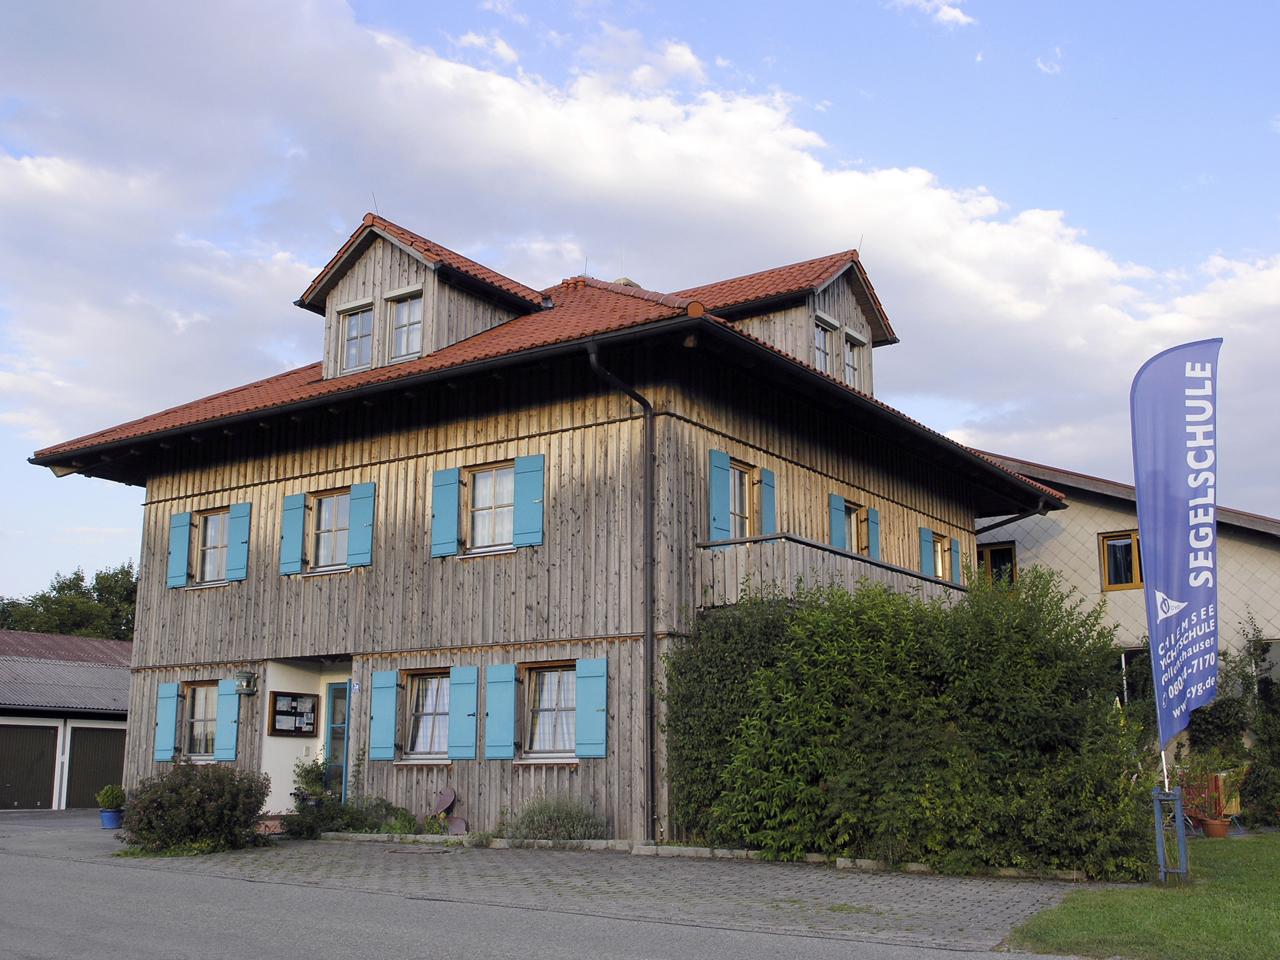 Seminarhaus Schunck, Chiemsee-Yachtschule Gollenshausen (Foto: © Ulli Reiter)